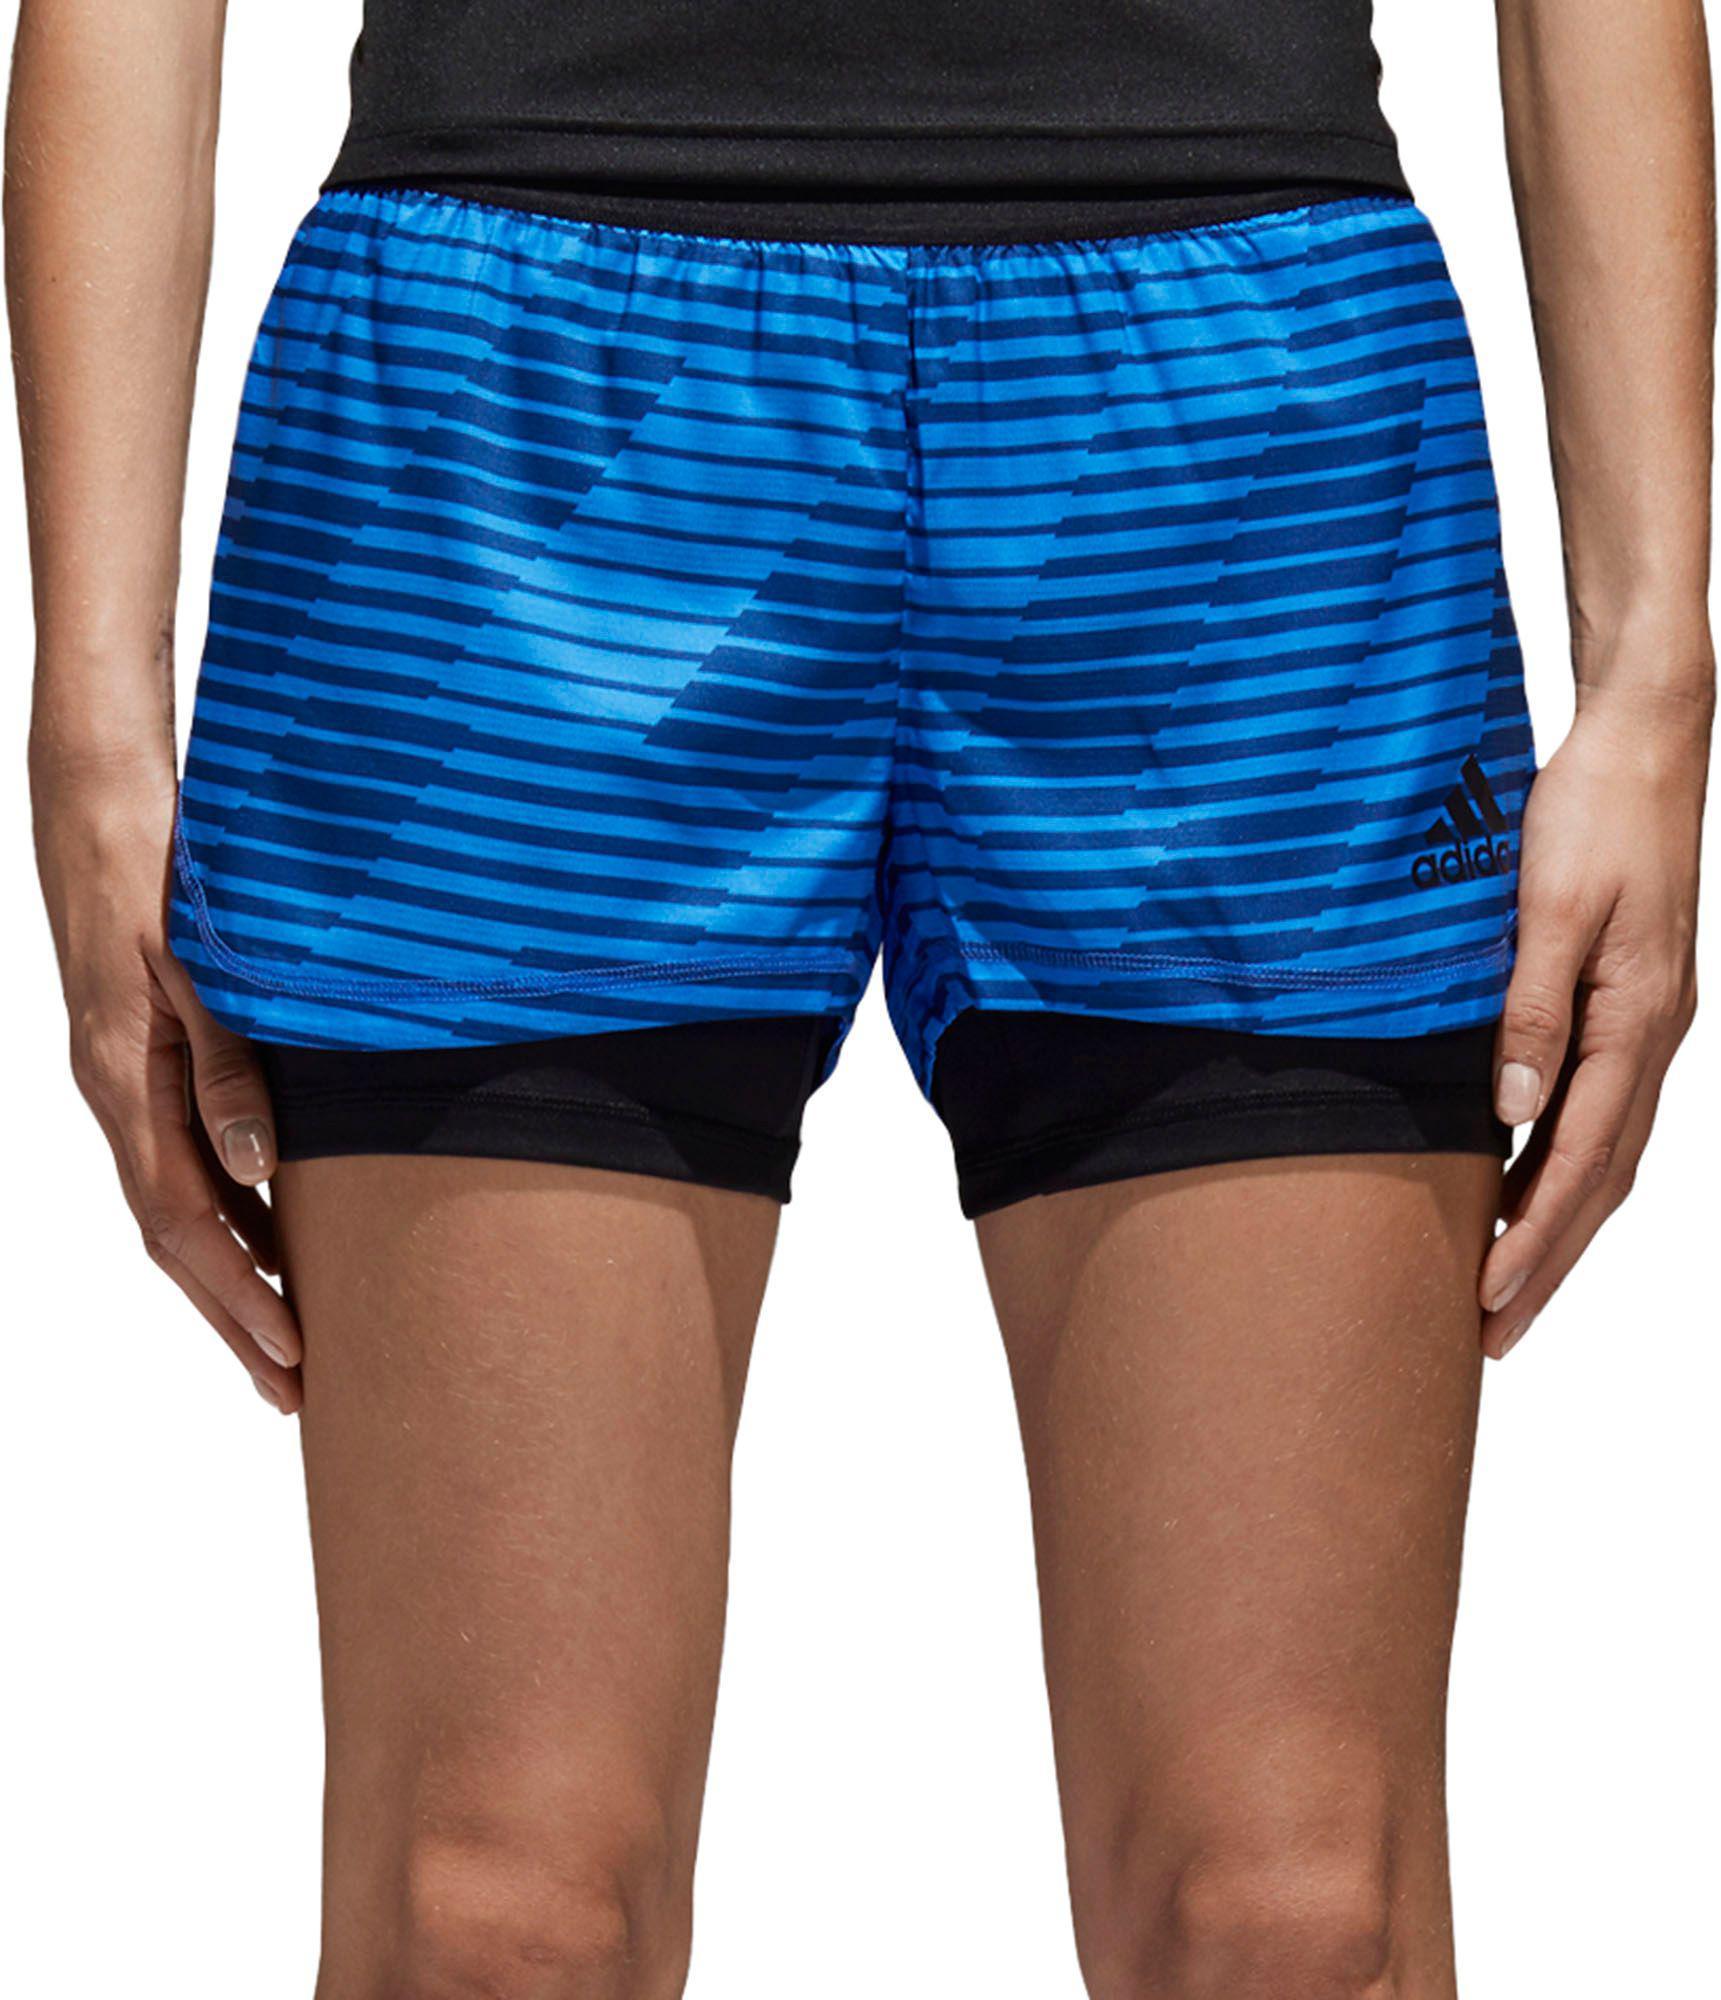 Lyst - adidas Tango 2-in-1 Shorts in Blue 64670447e4b53